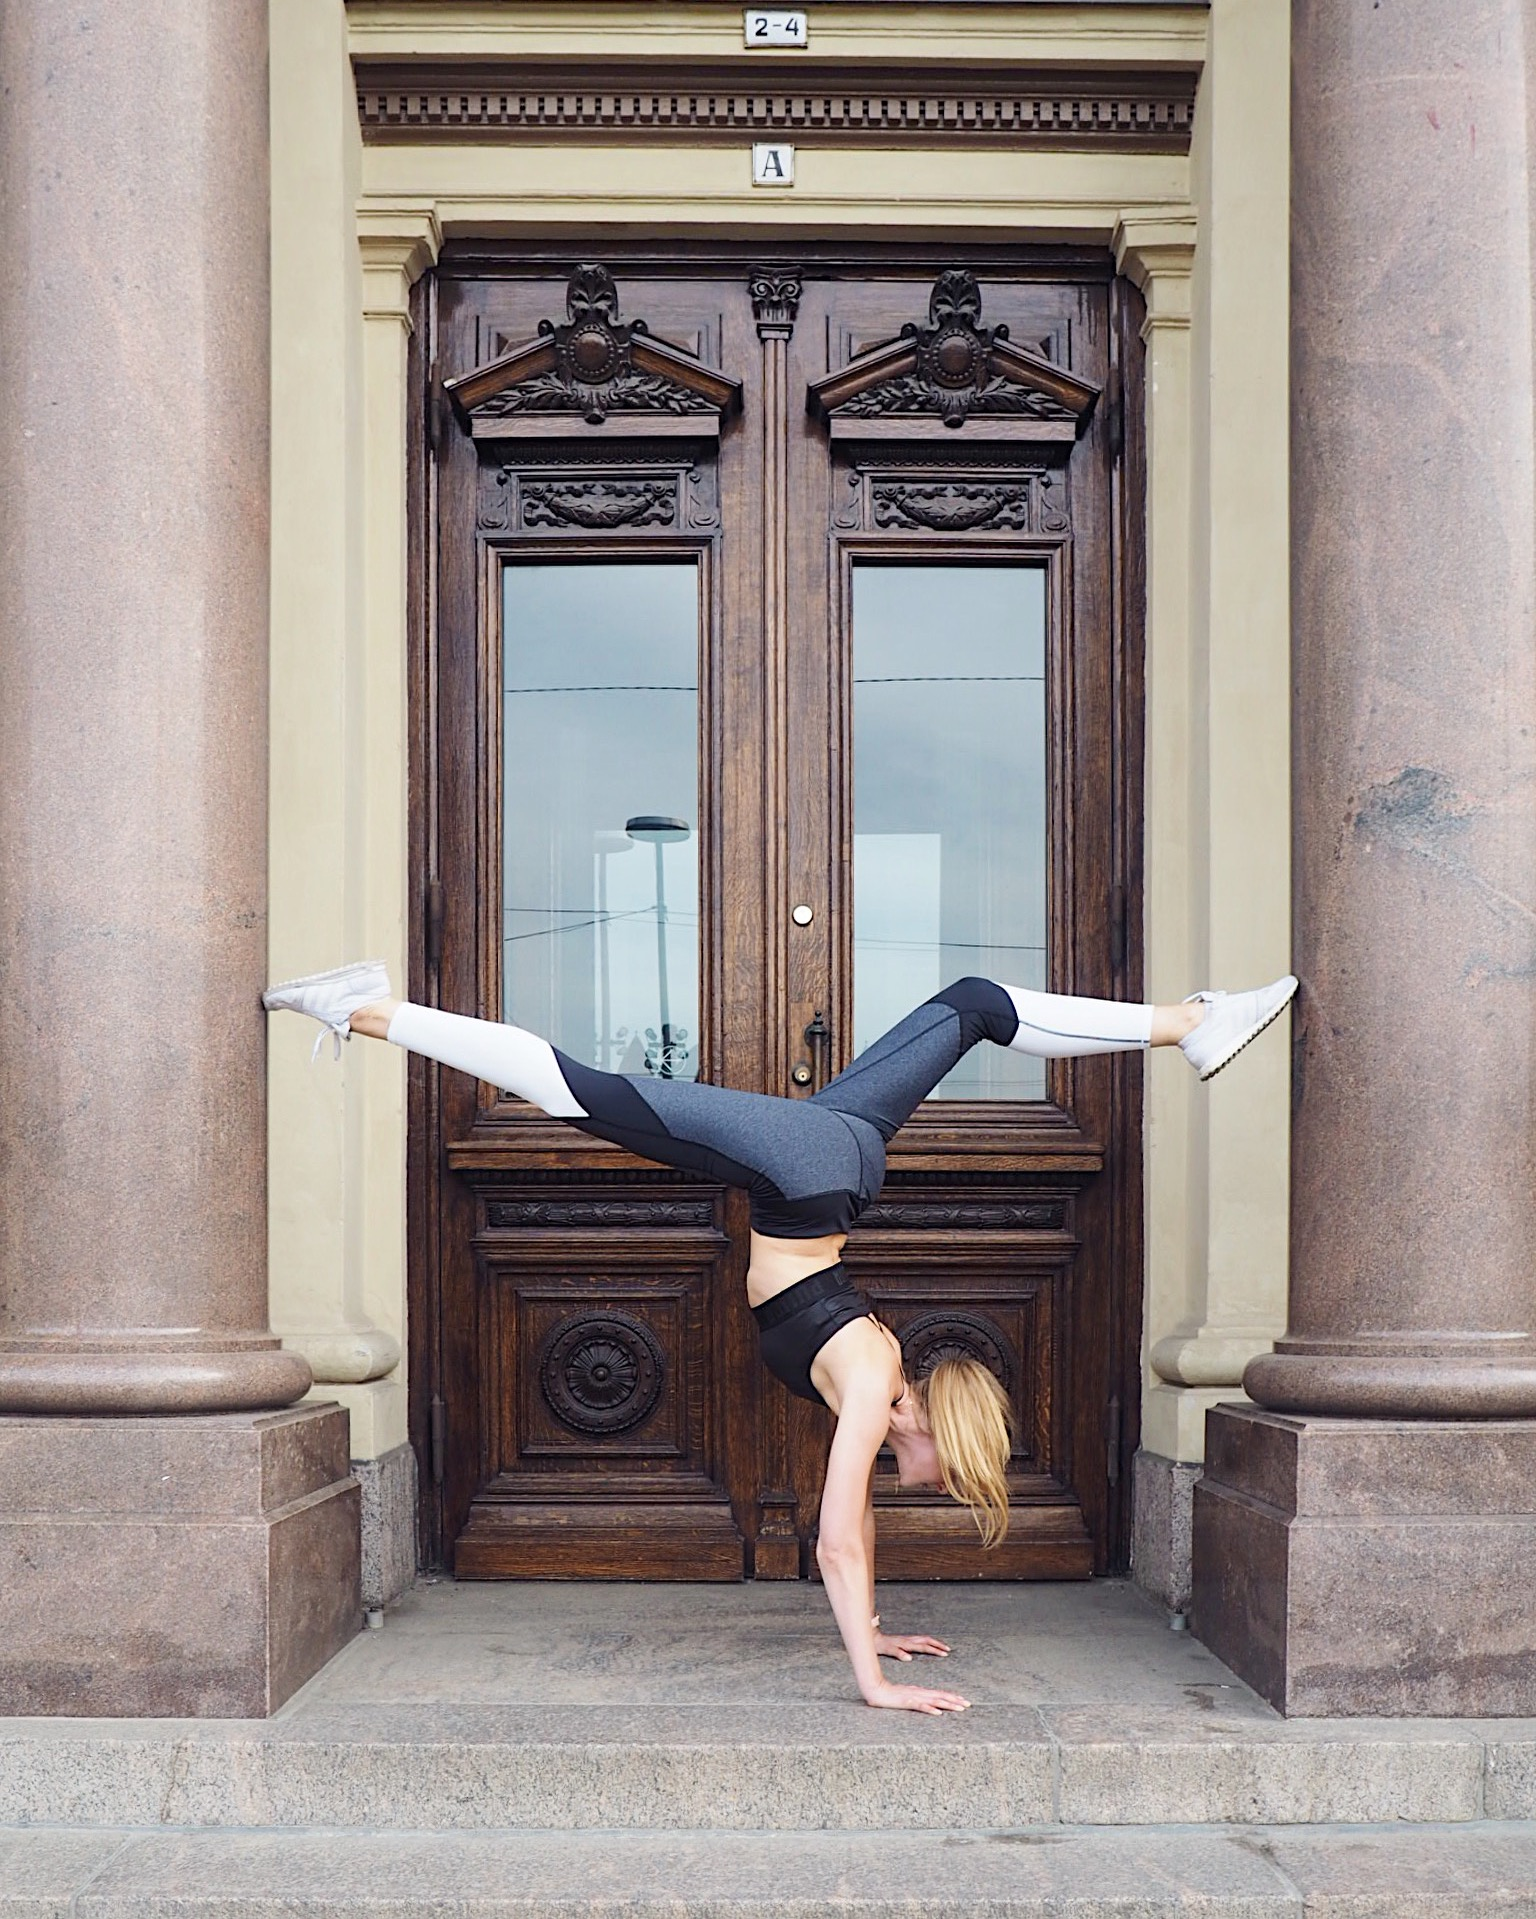 Yoga handstand adidas nike